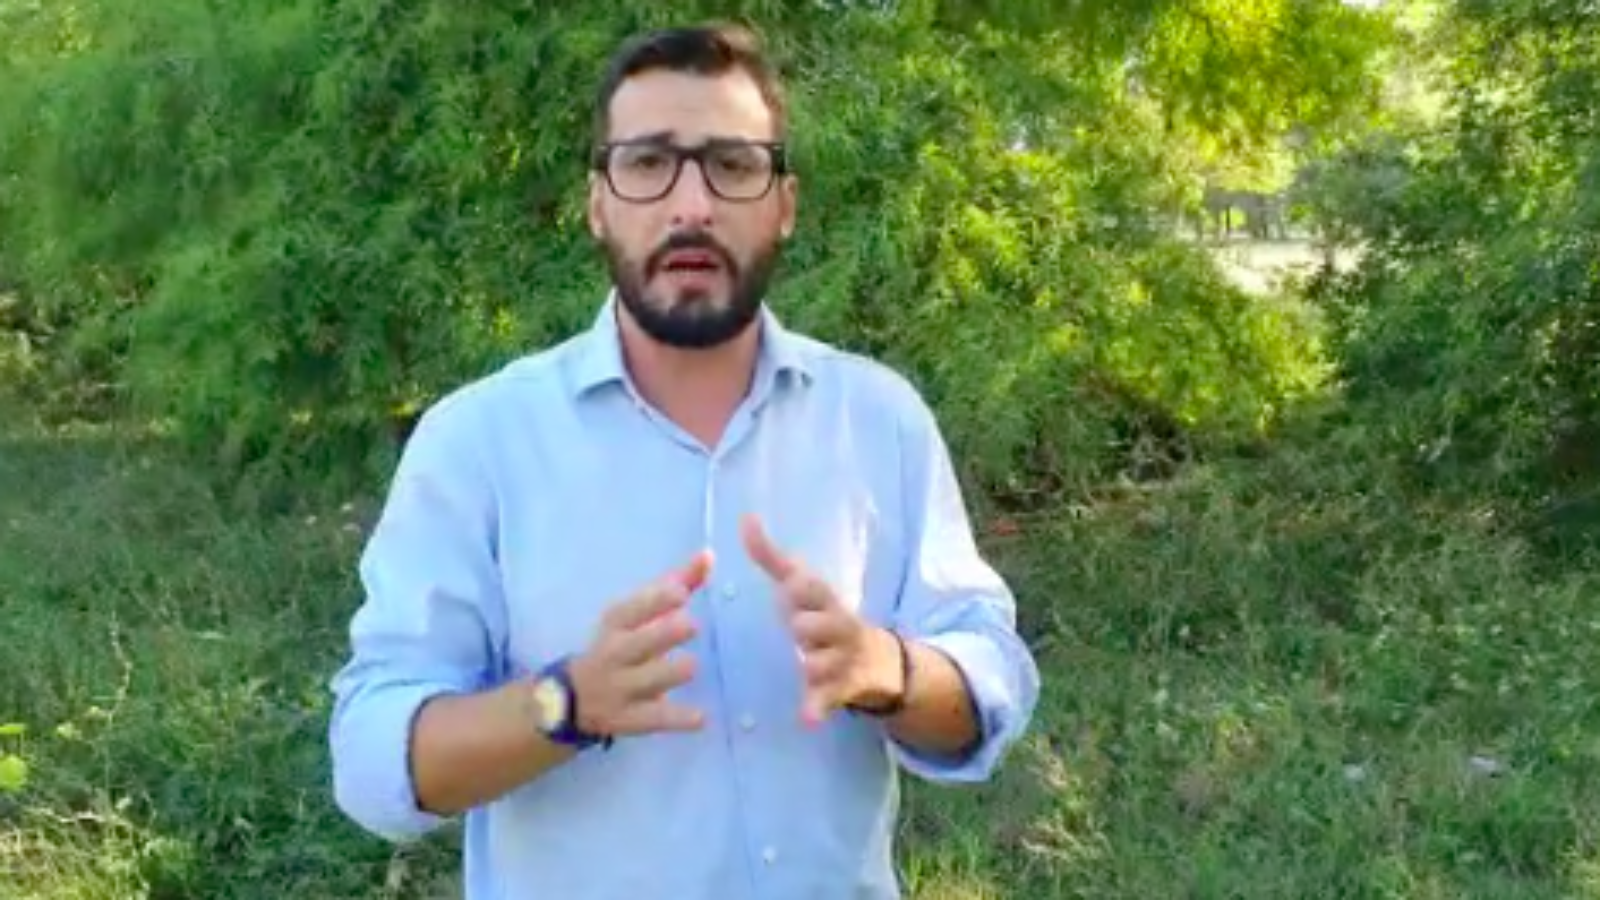 Matteo Bagnoli